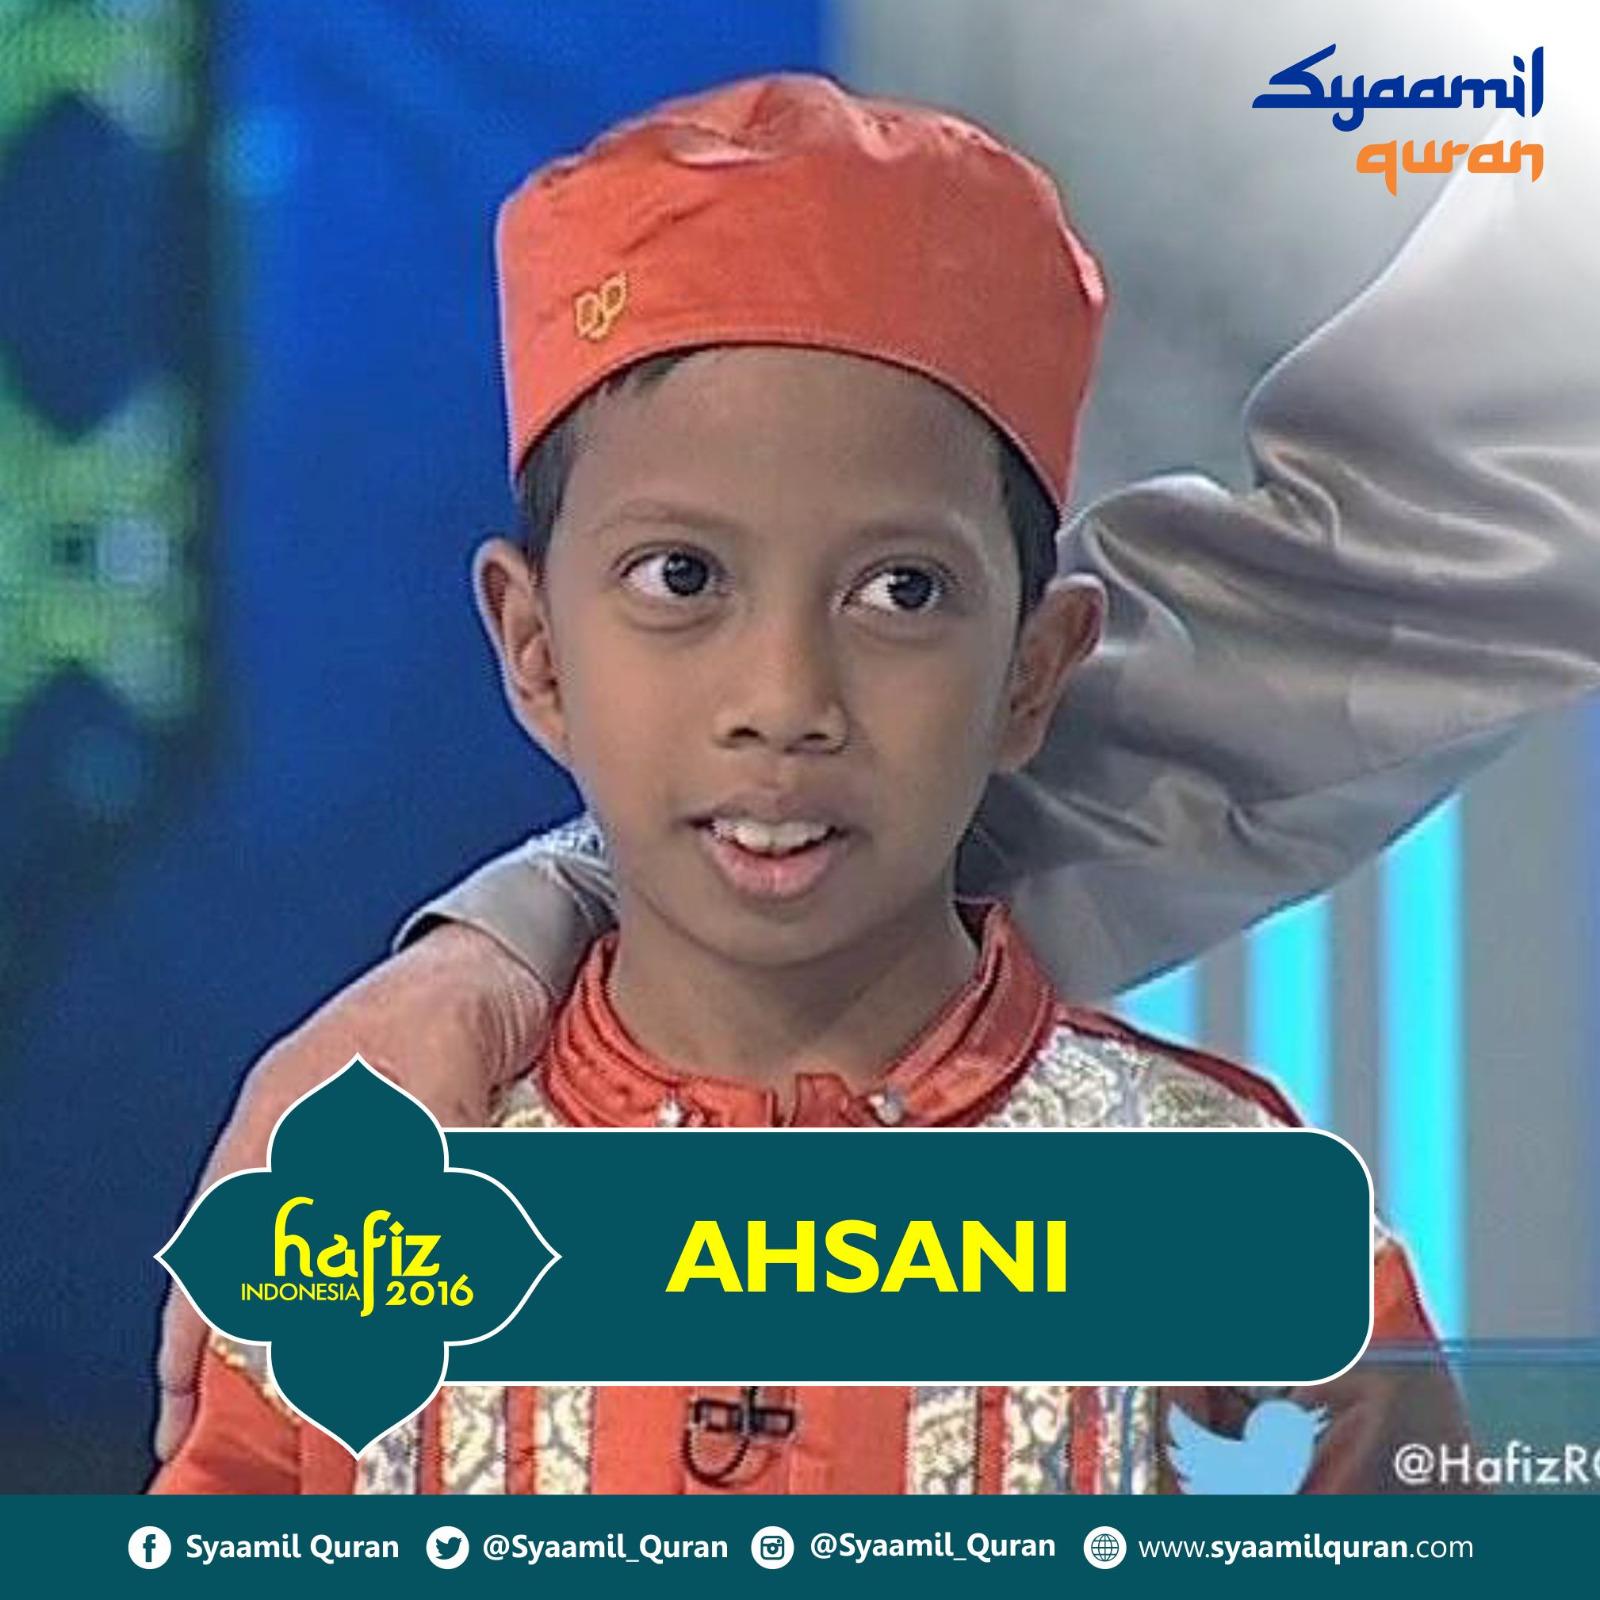 Ahsani - Hafiz Indonesia 2016